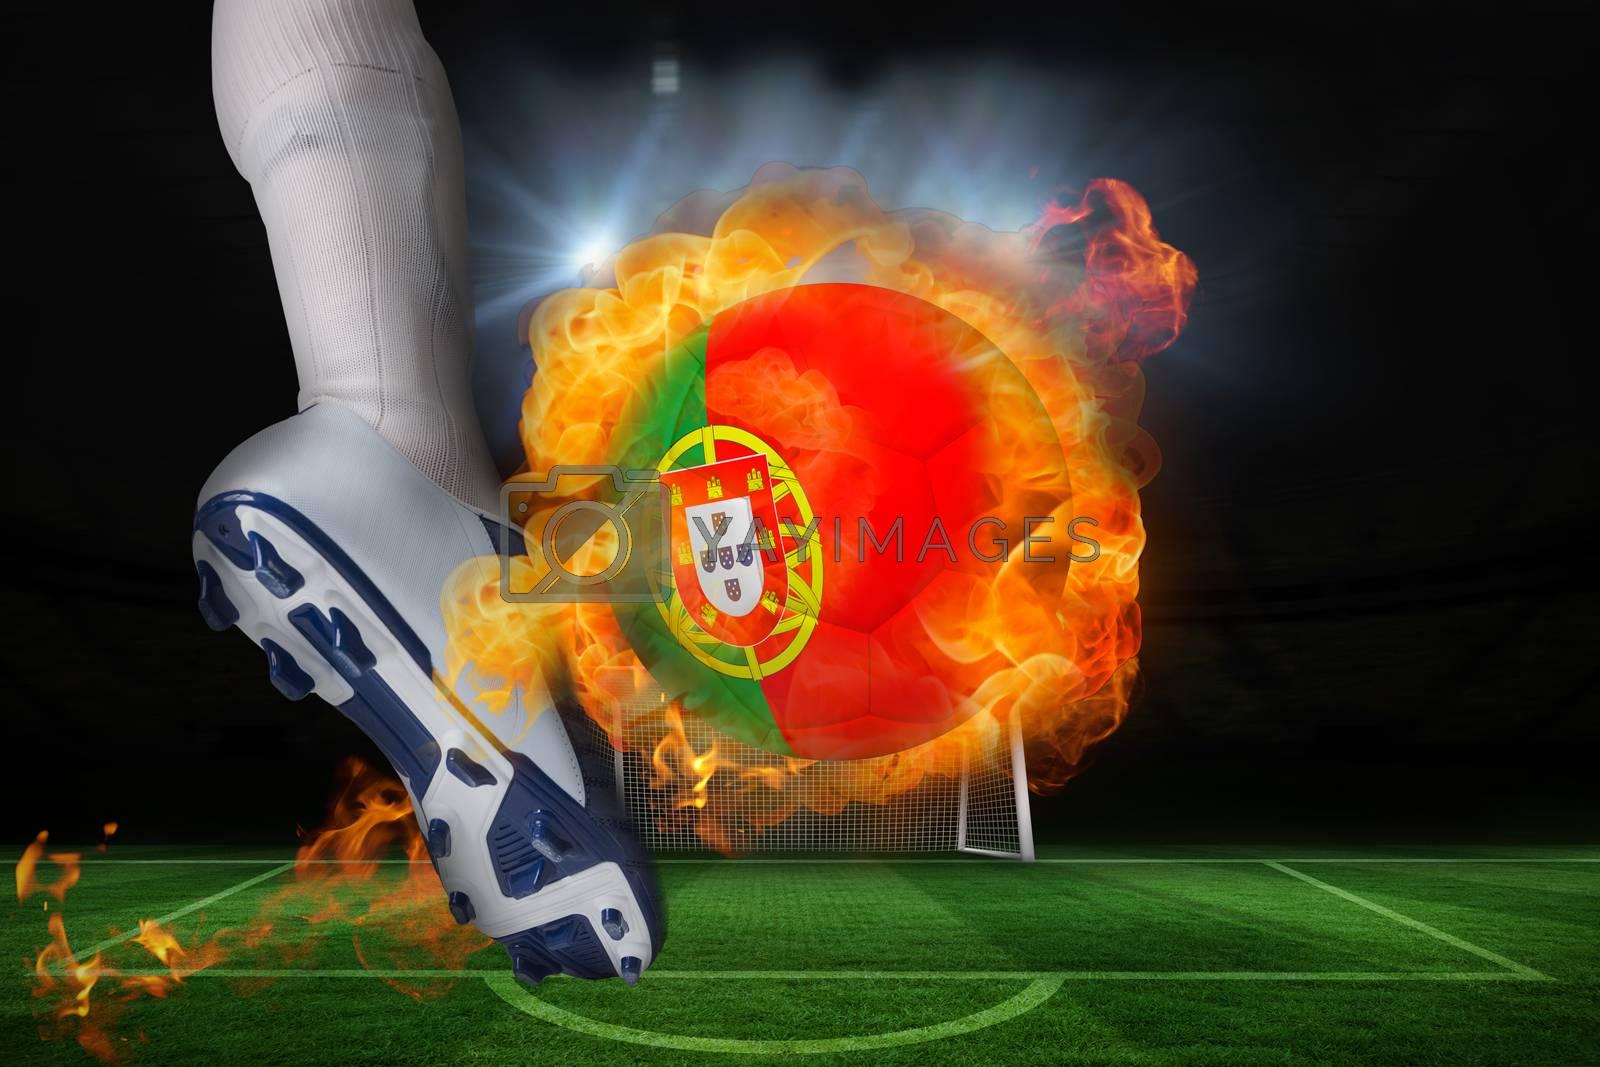 Football player kicking flaming portugal flag ball by Wavebreakmedia